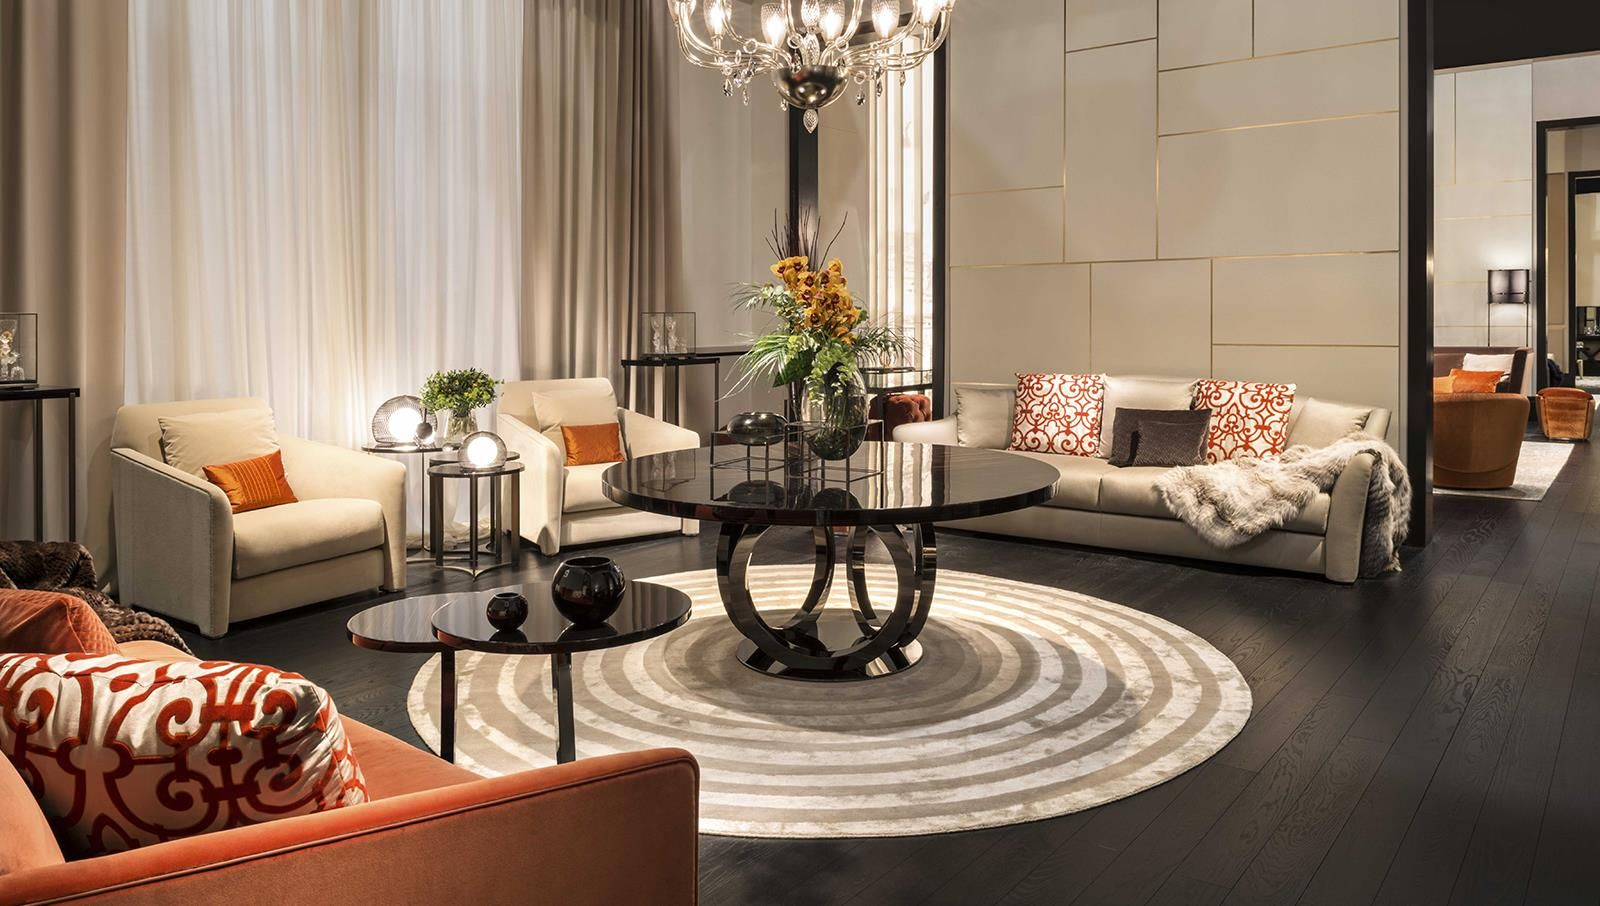 Fendi Casa Interior Collections By Luxury Living Group Fendi  # Muebles Fendi Casa